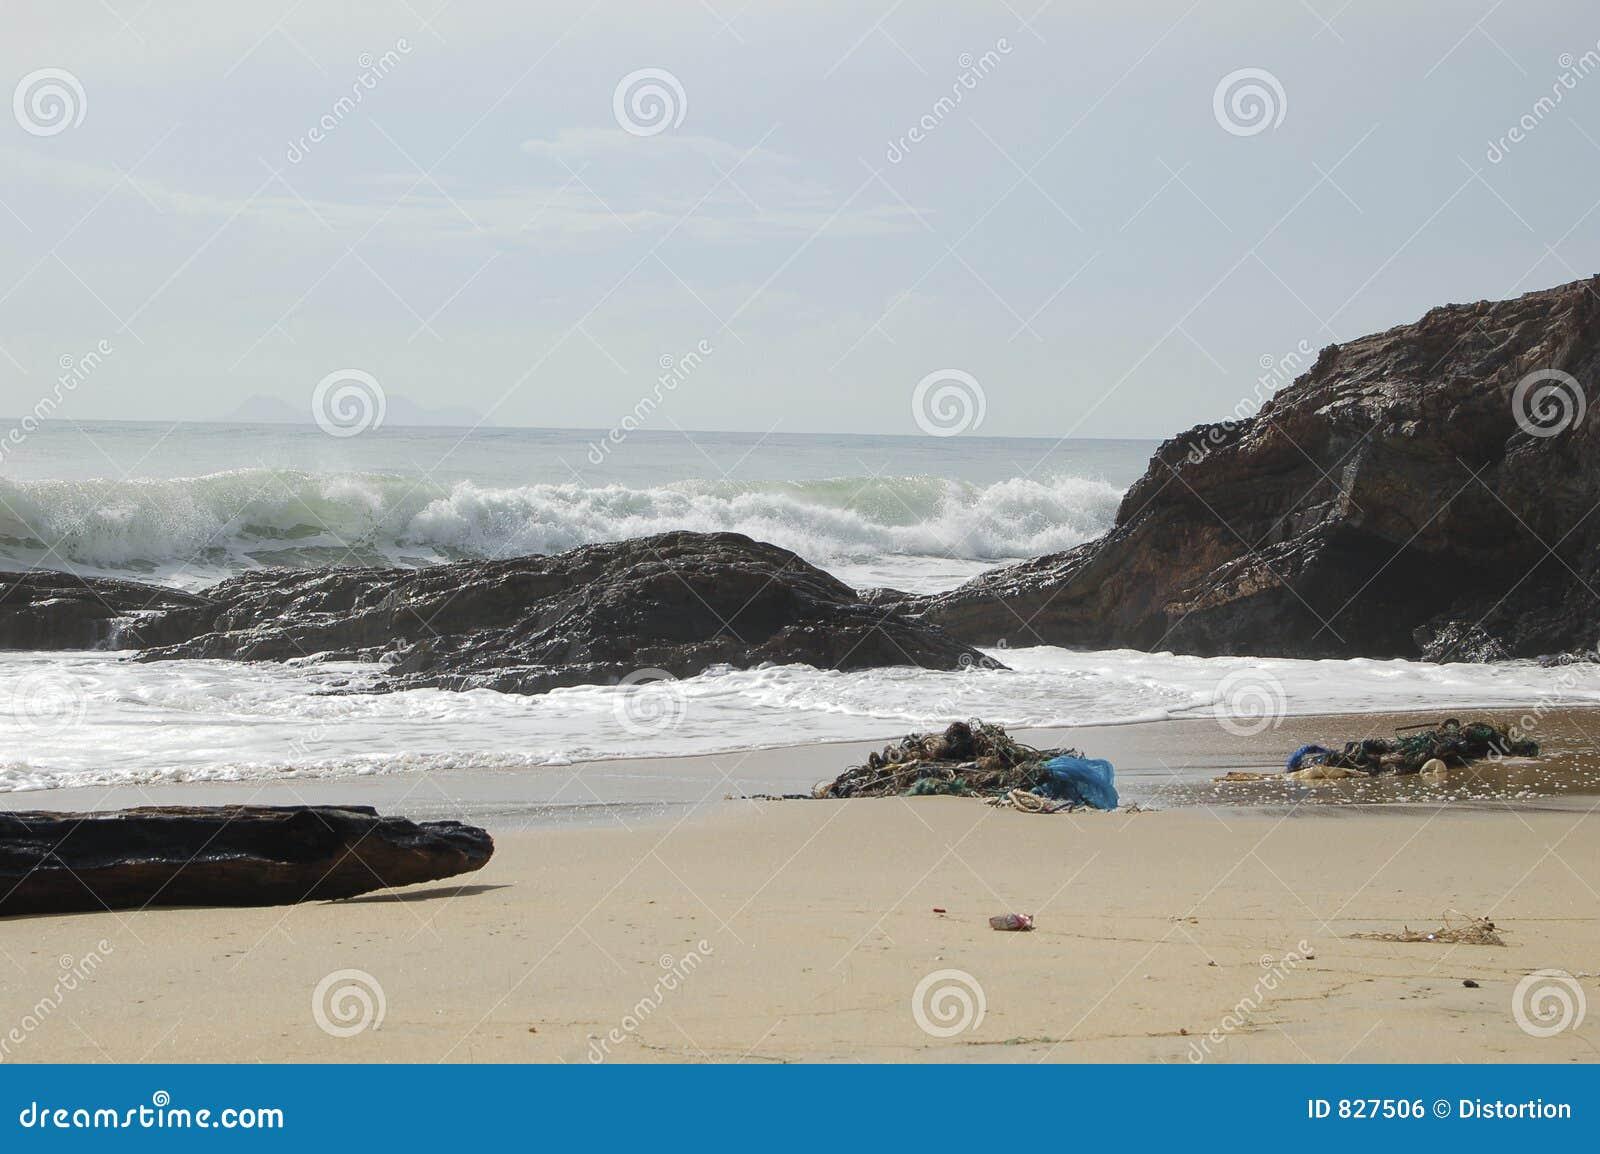 Waves3